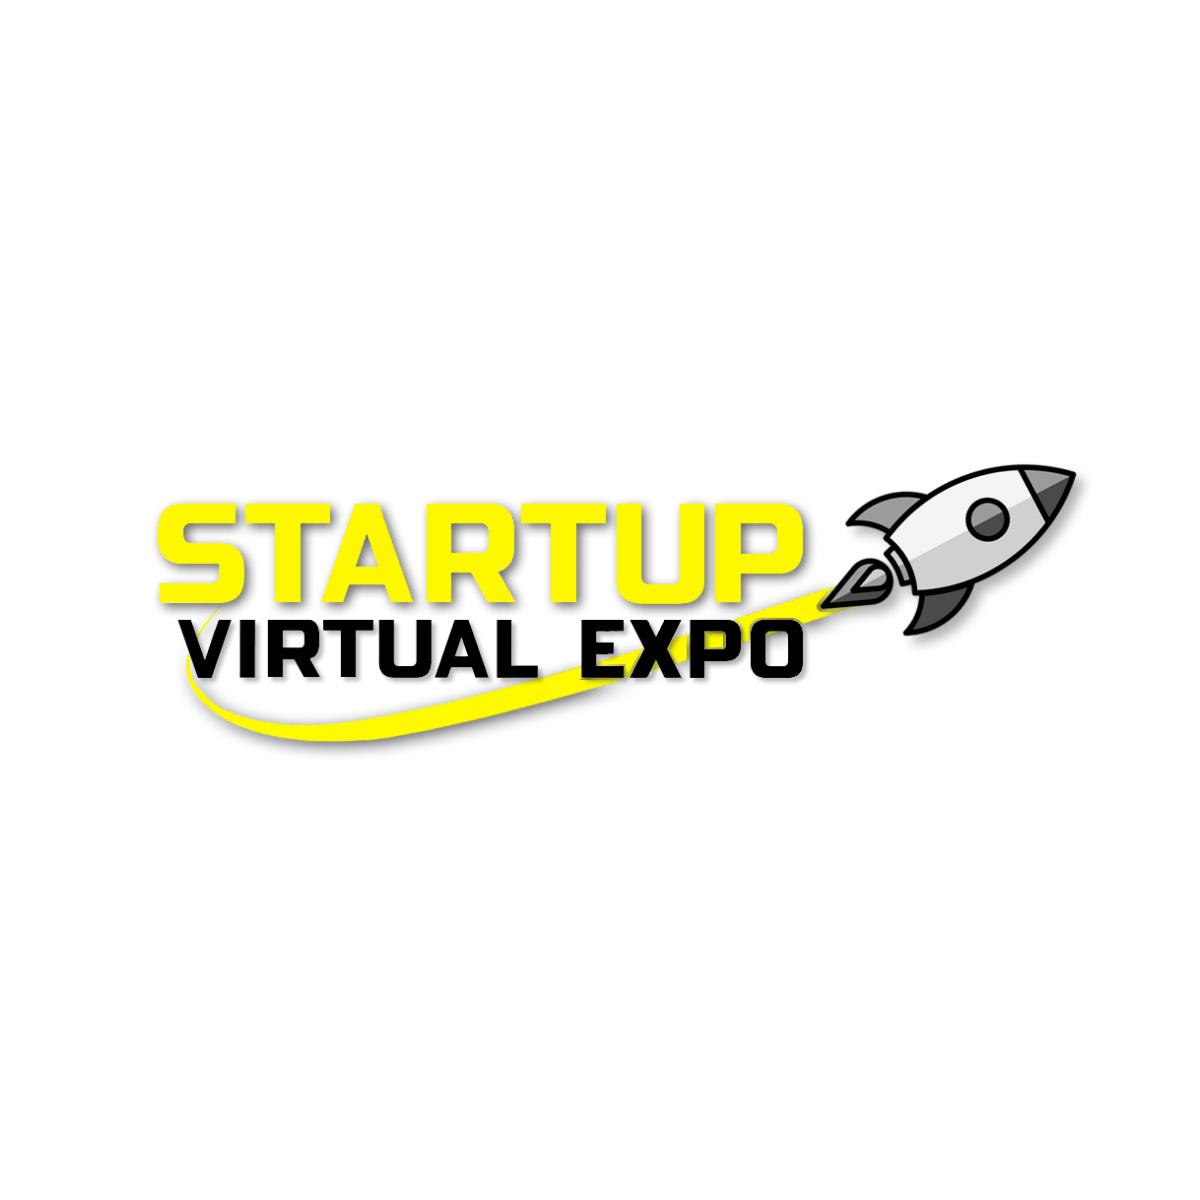 Startup Virtual Expo